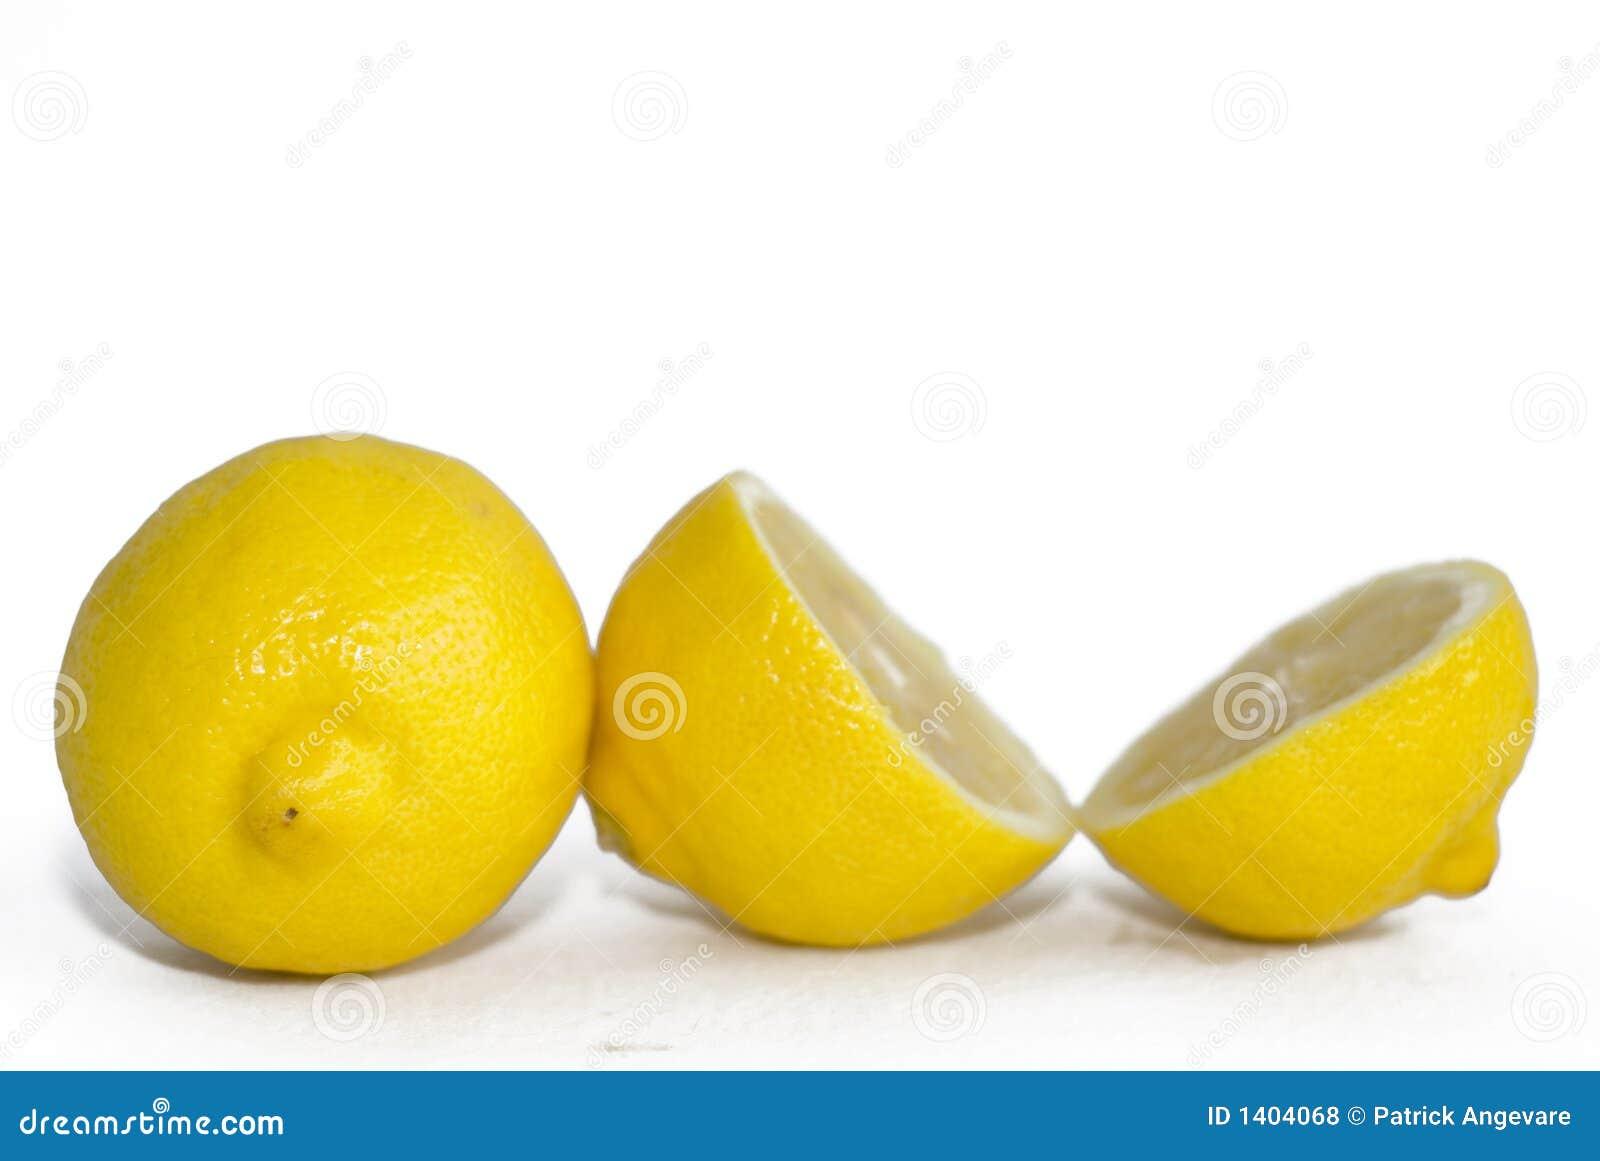 Citrons jaunes lumineux